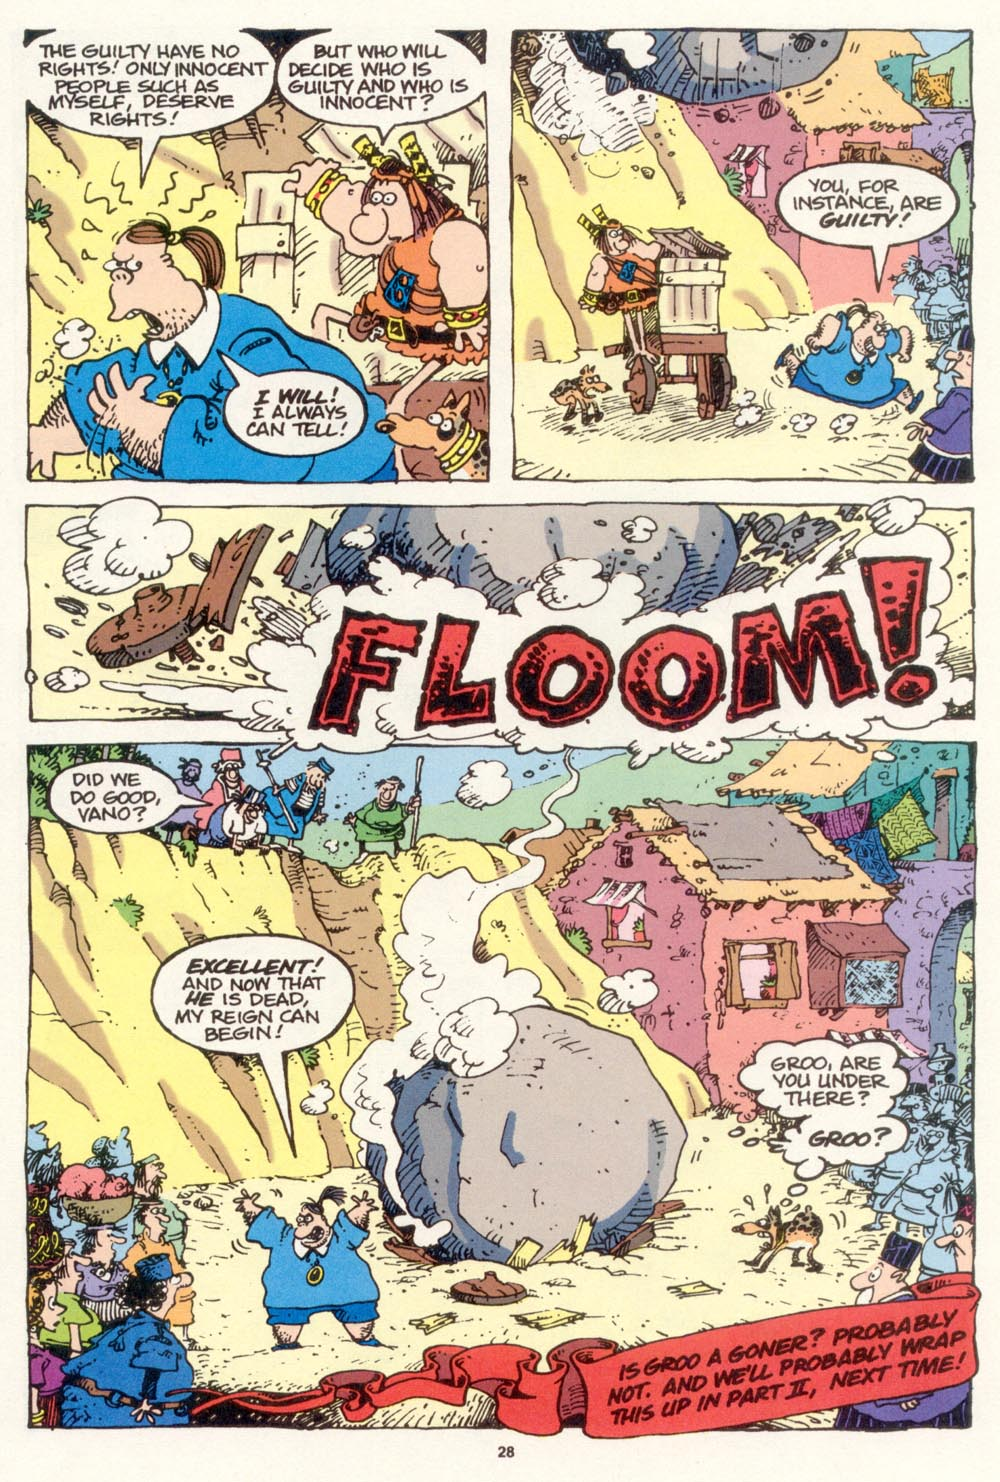 Read online Sergio Aragonés Groo the Wanderer comic -  Issue #118 - 30